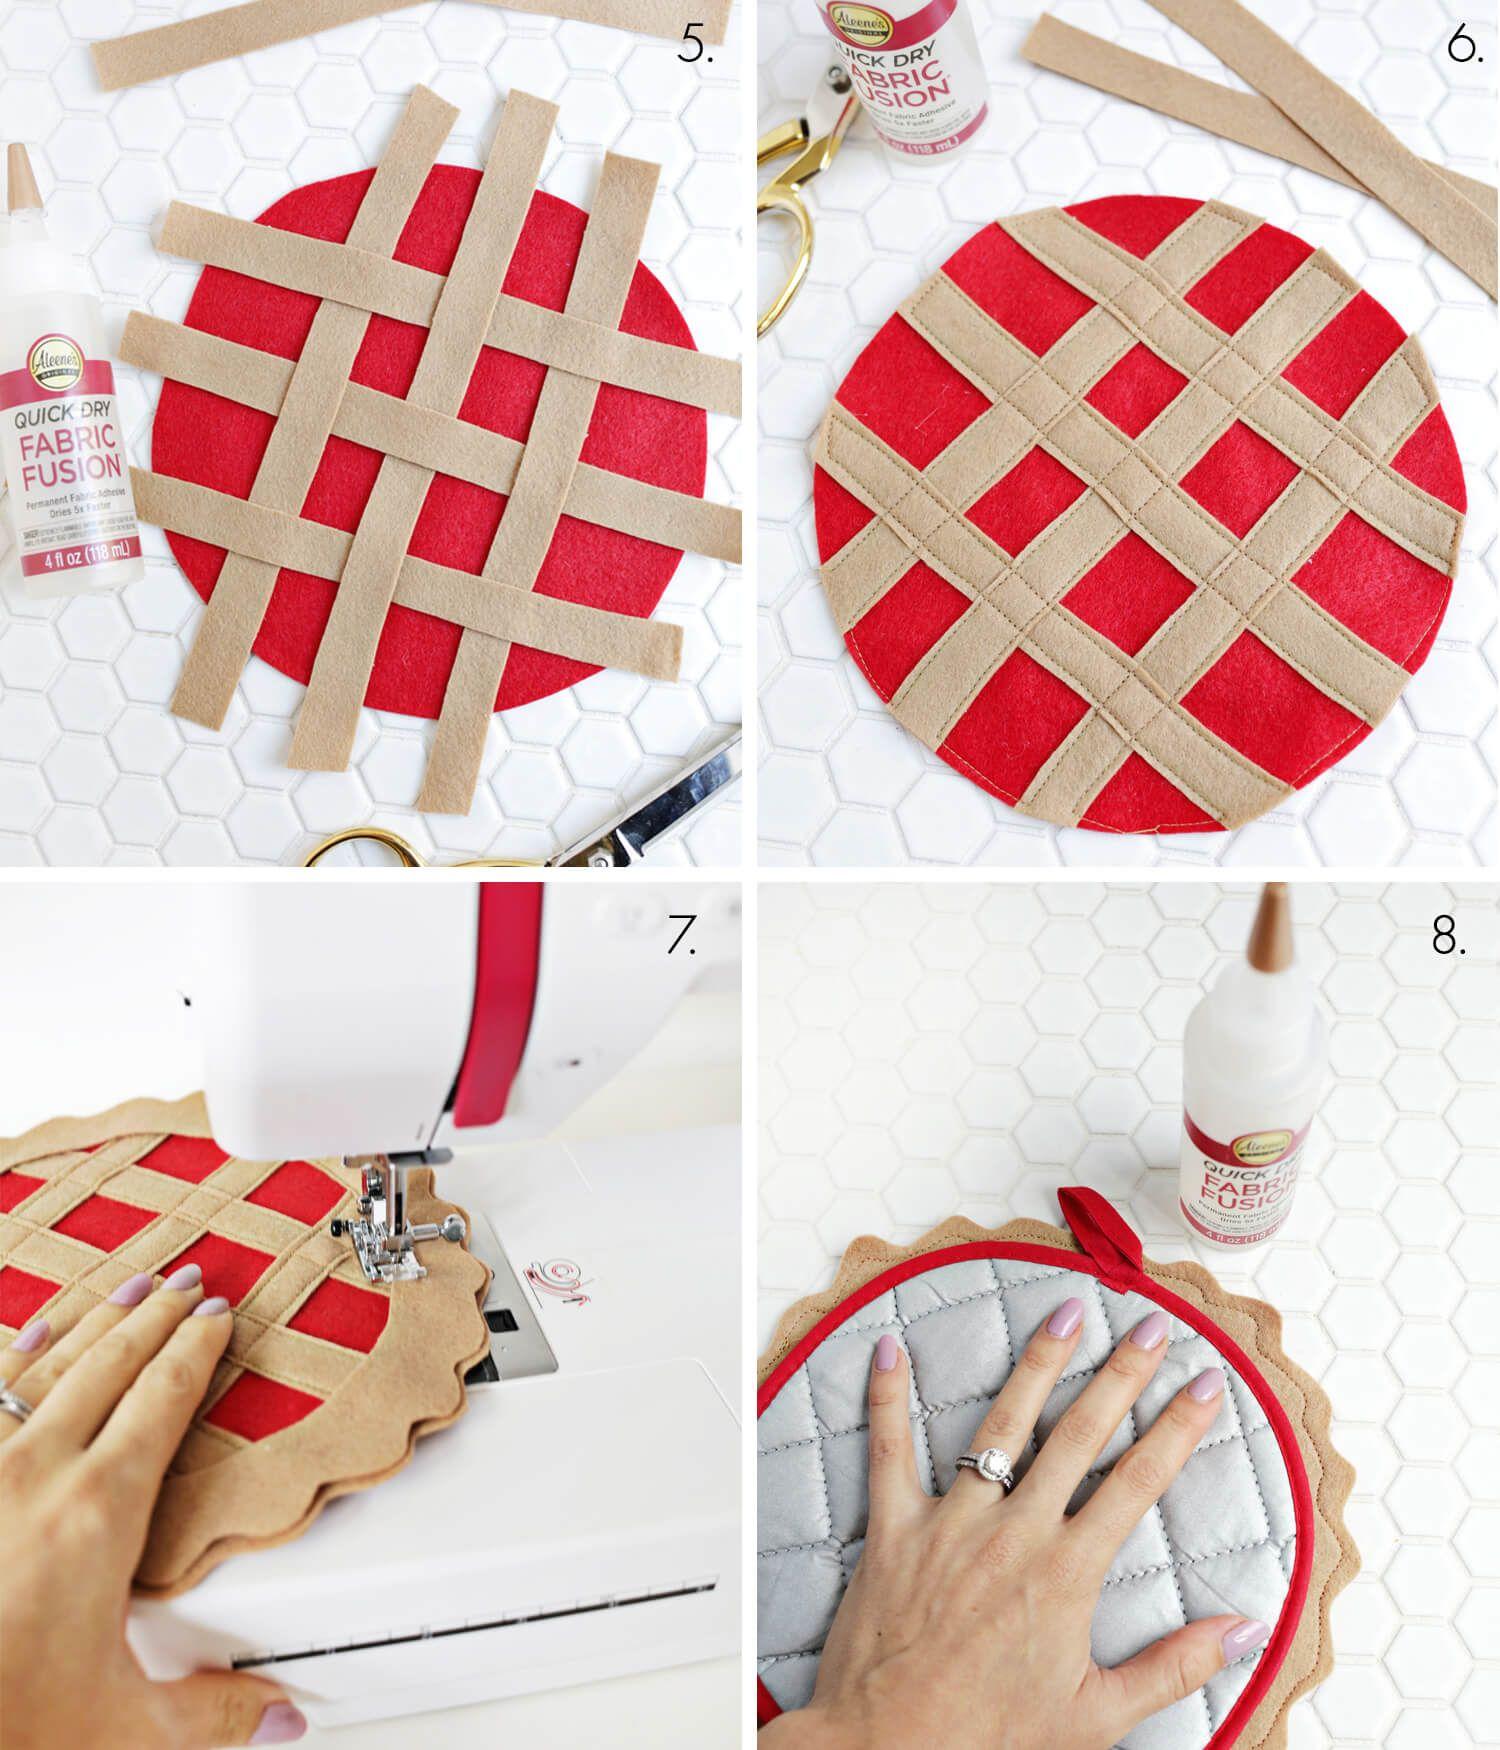 Cherry Pie Potholder Diy Sewing Crafts Potholder Diy Pot Holders